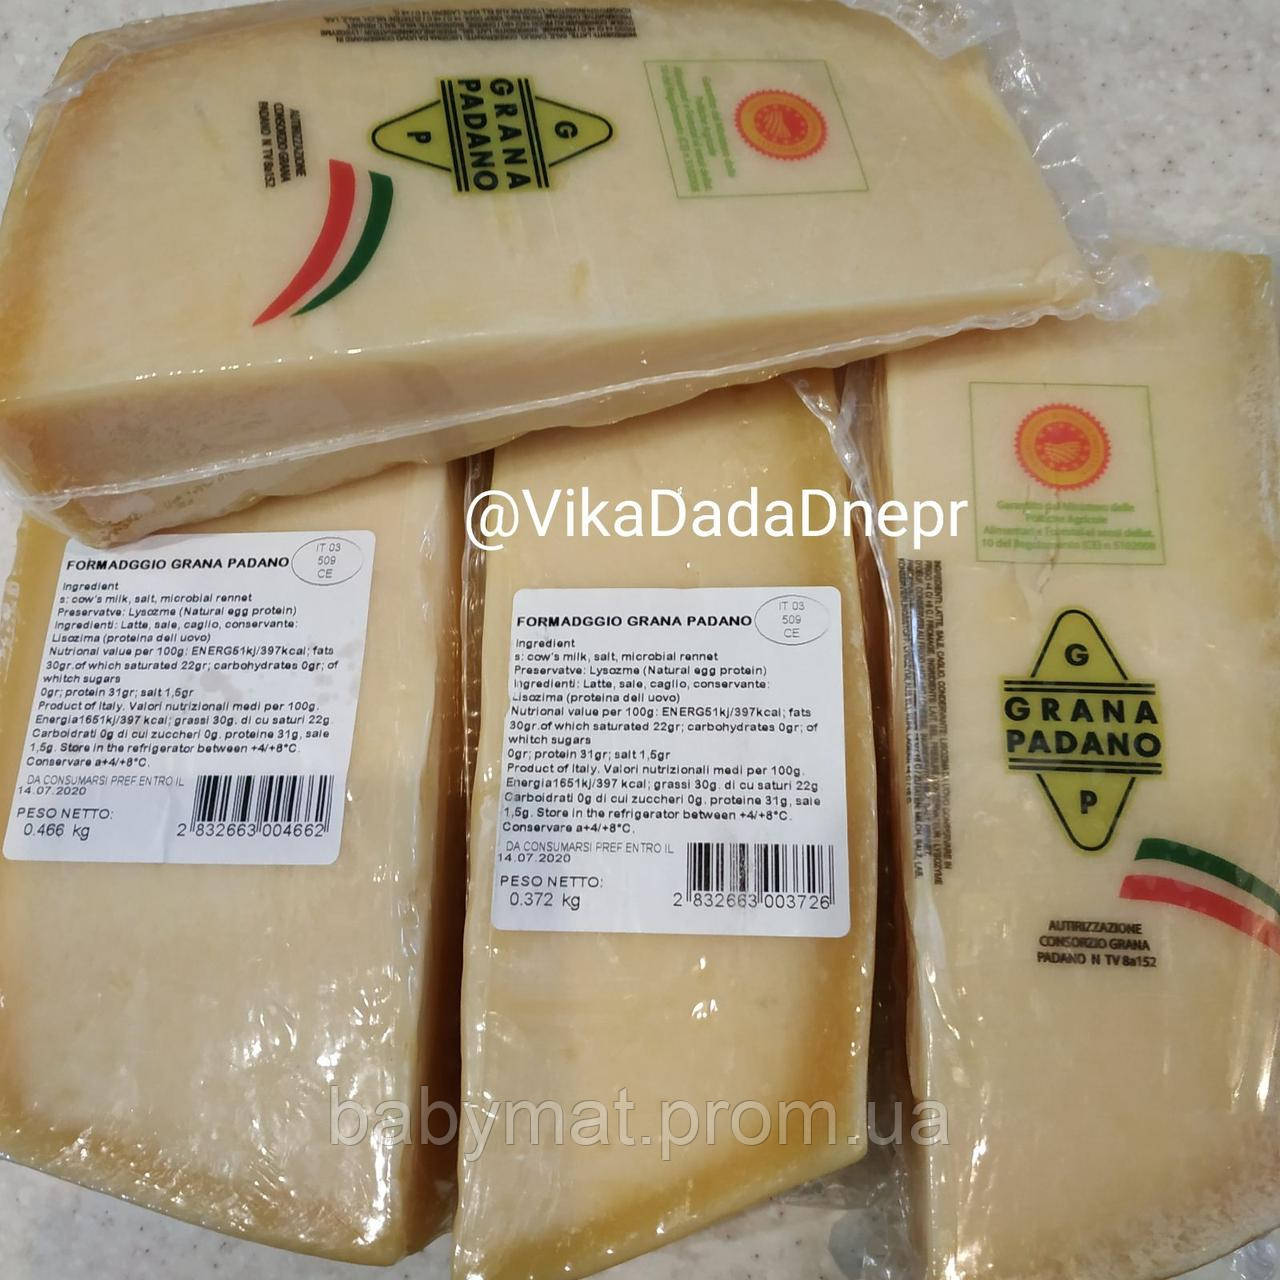 Сыр Formadggio Grana Padano Италия высший сорт 420 гр